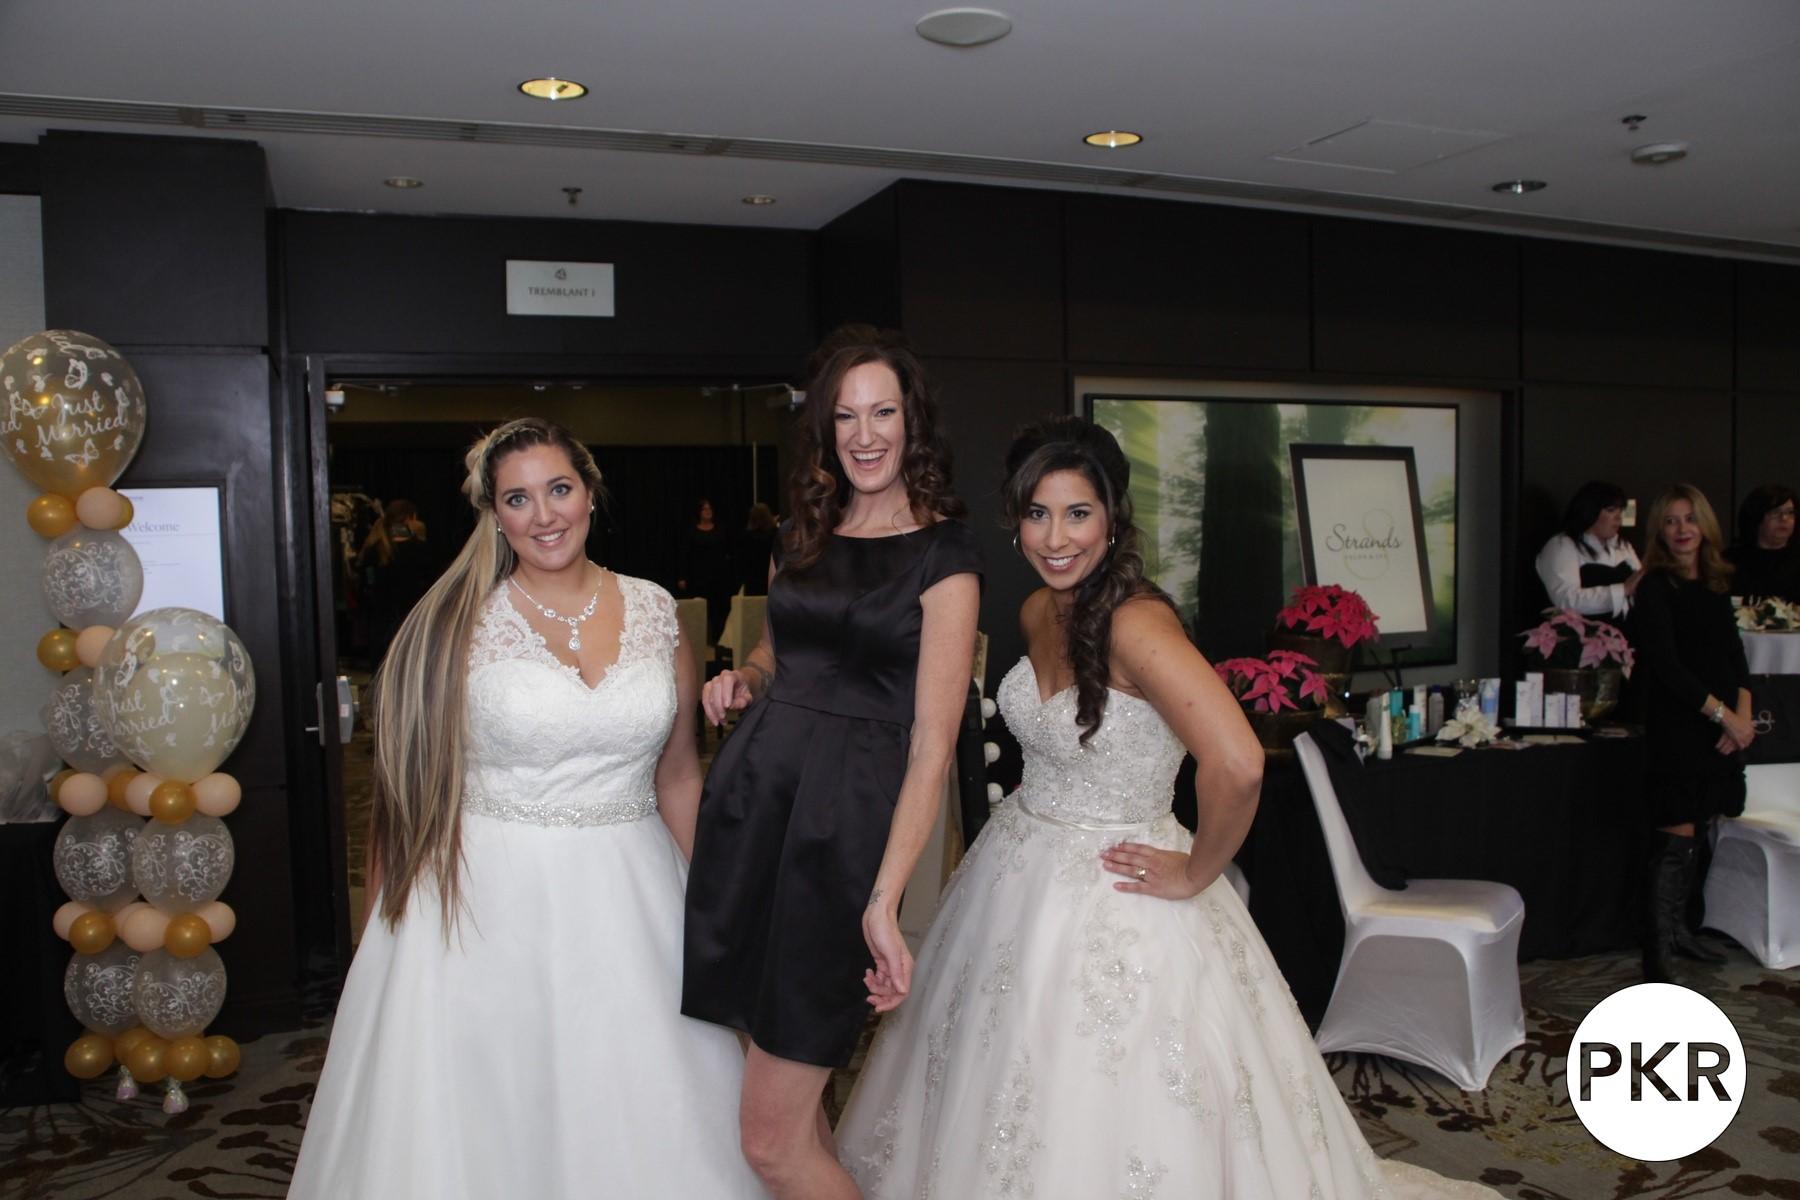 http://truewedding.ca/